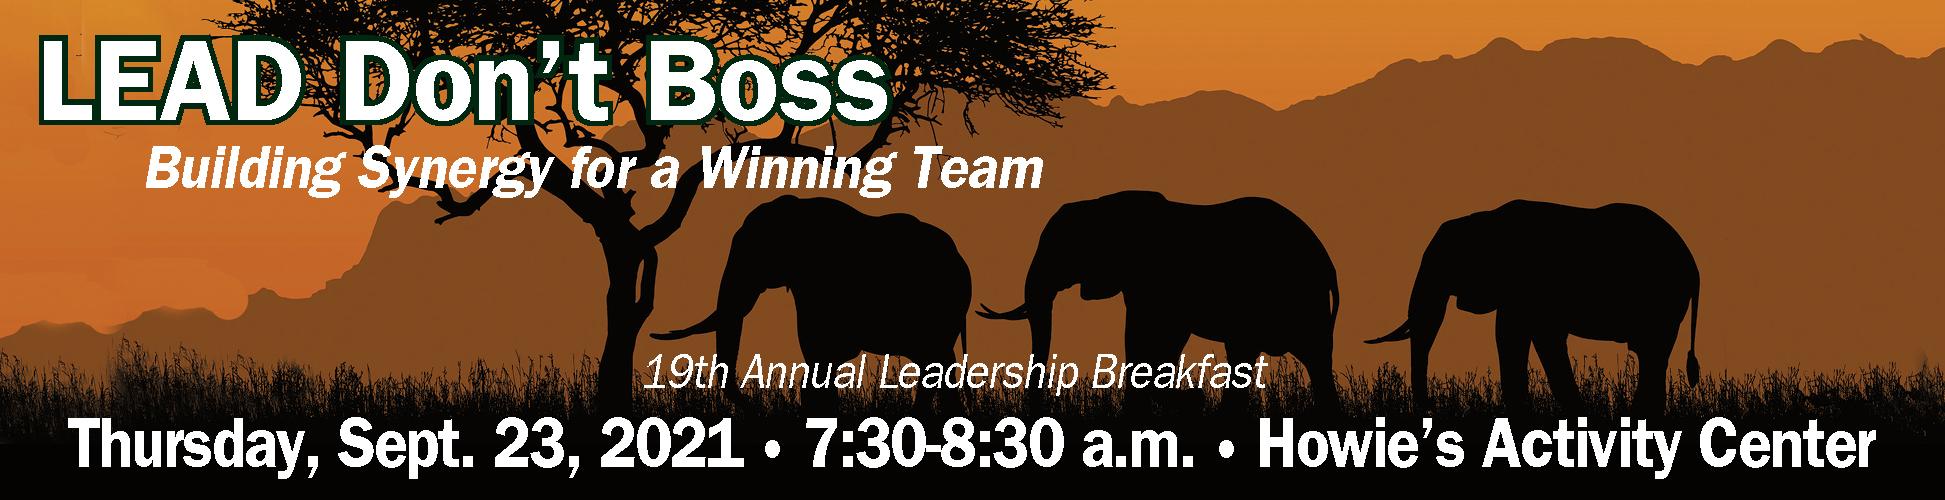 2021 leadership breakfast banner